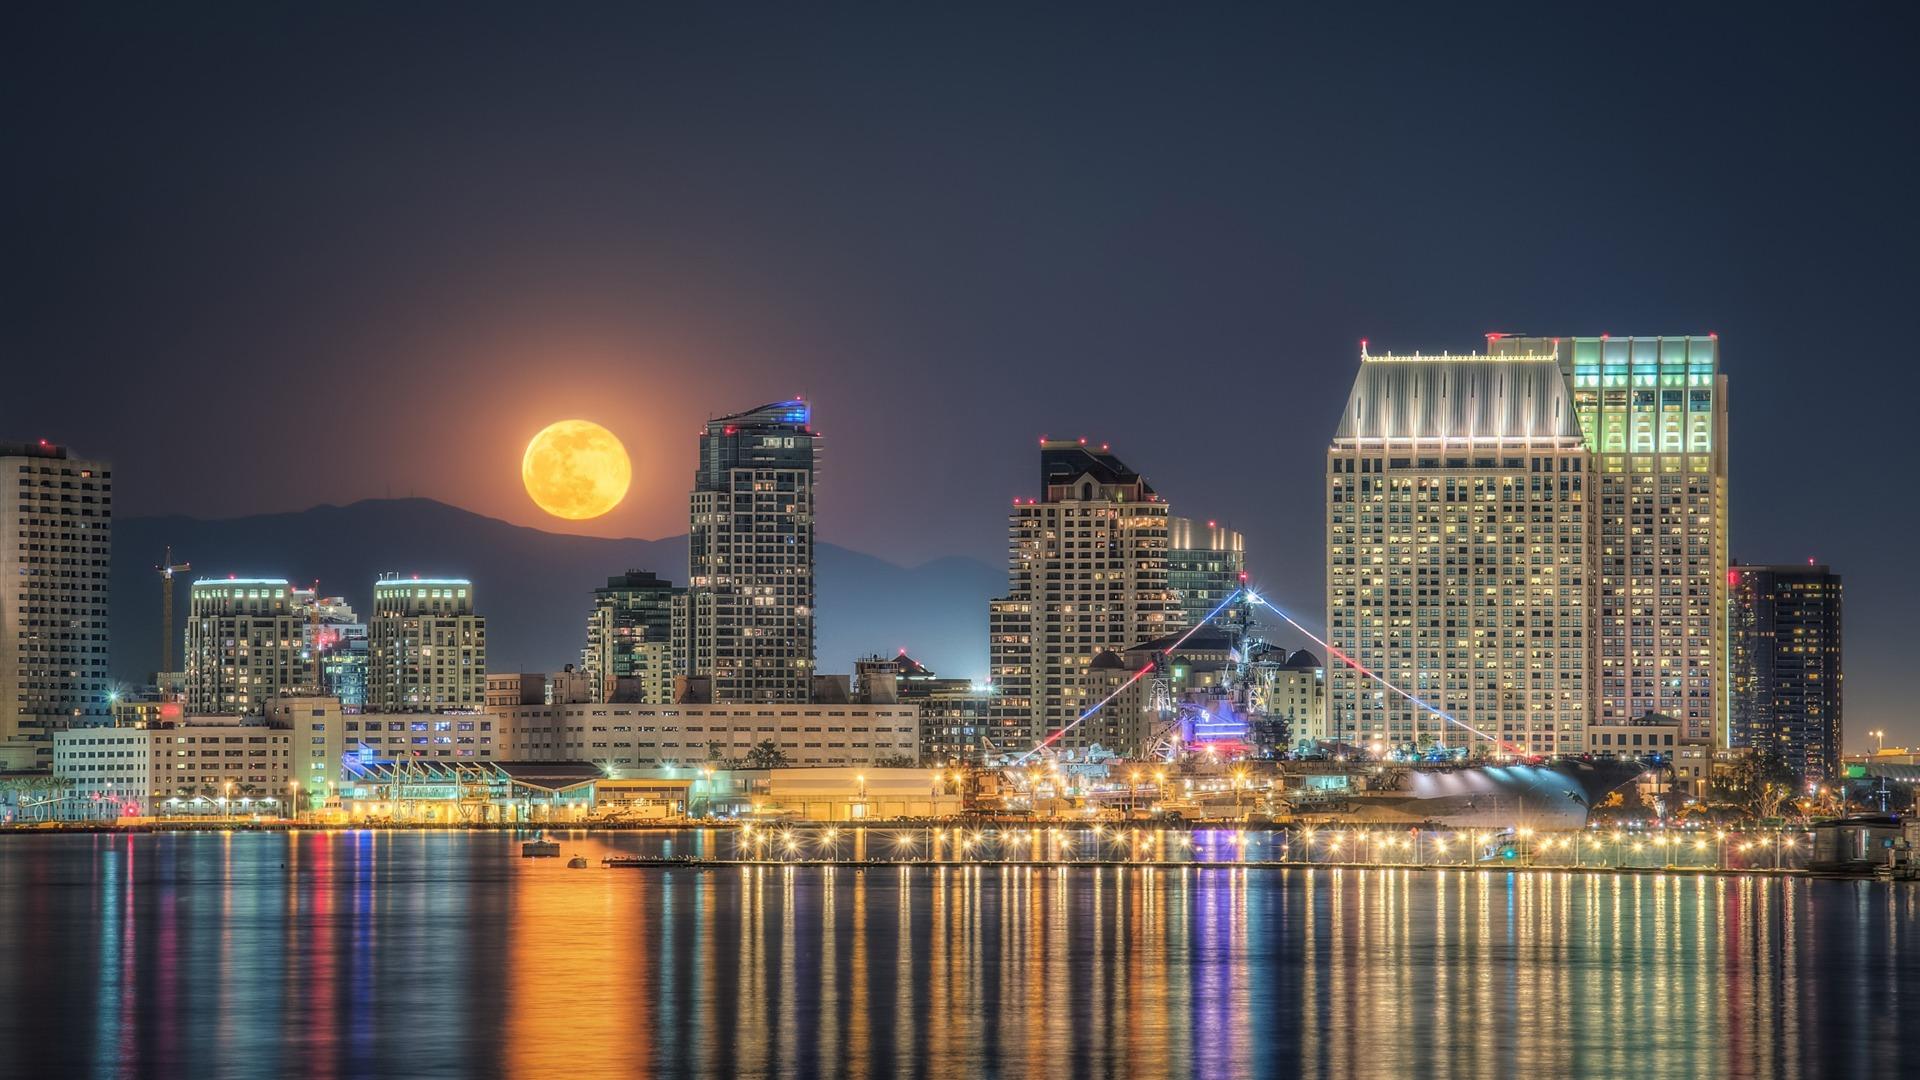 Full Moon Rising San Diego Hd Desktop Wallpaper Preview 10wallpaper Com